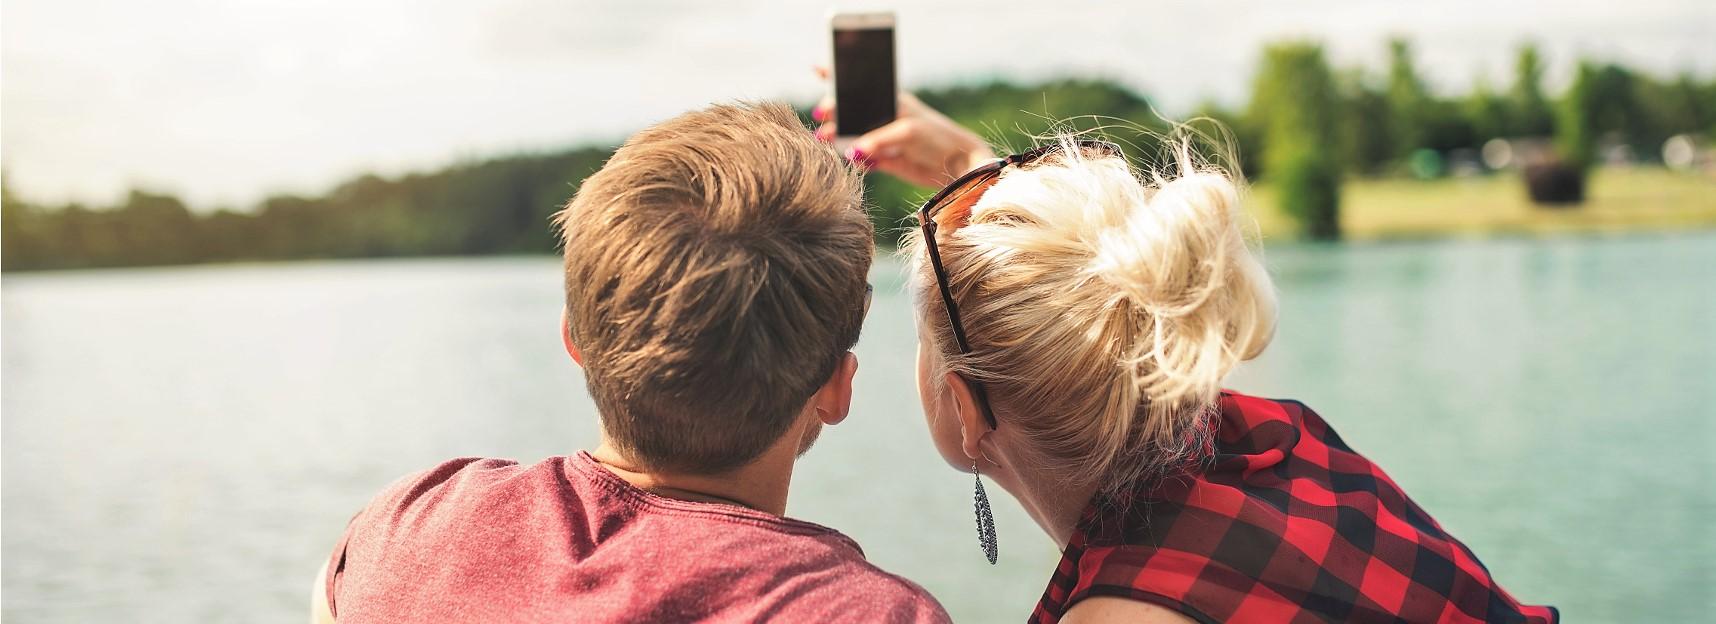 Selfie-Couple-App-Home-Mortgage-Loan